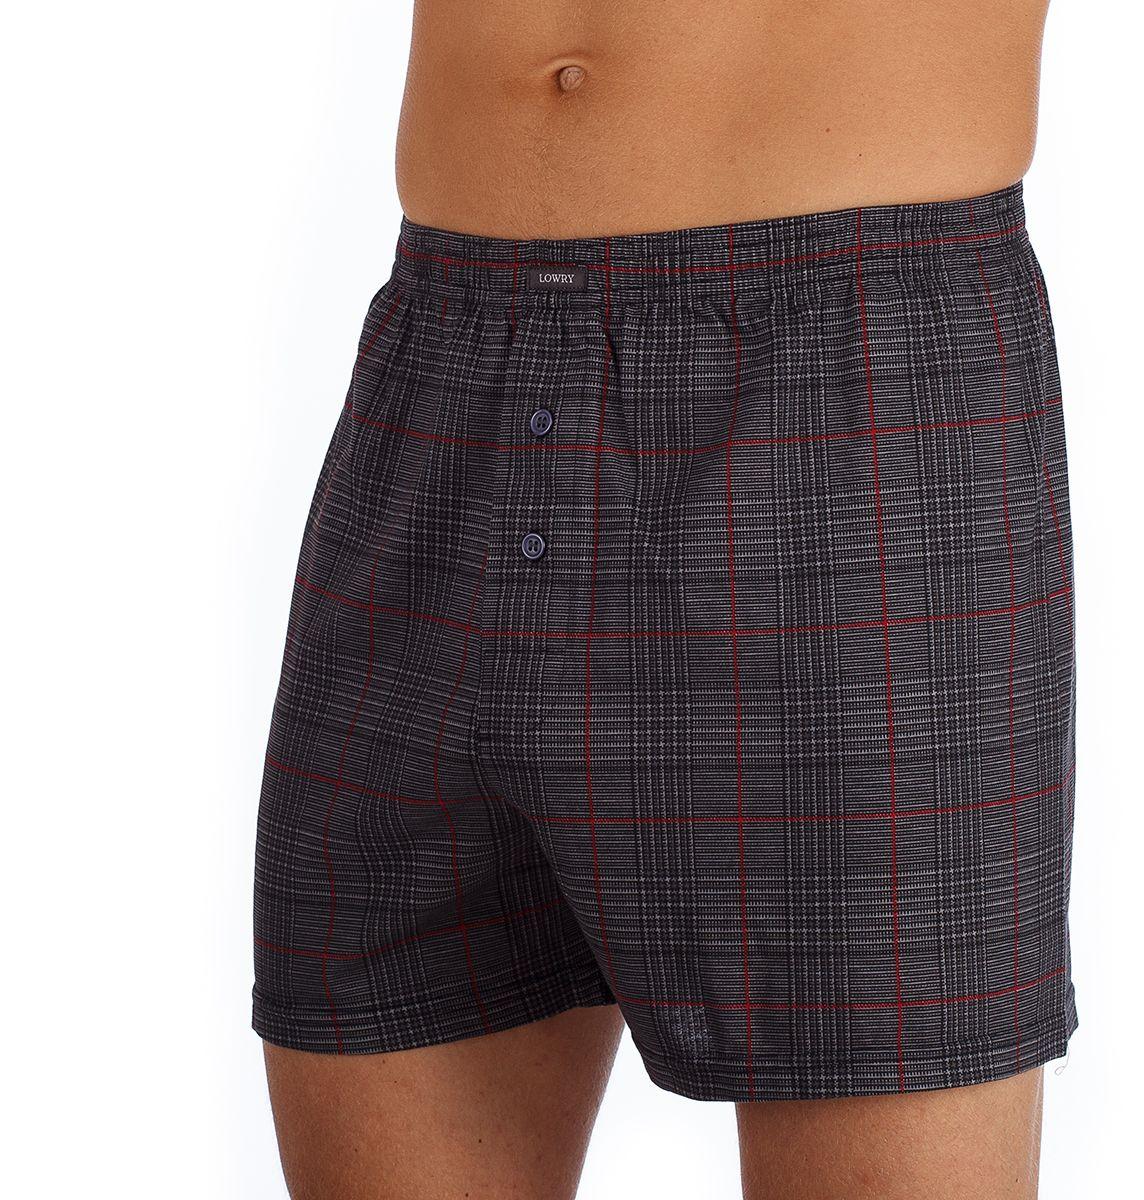 Фото Трусы-шорты мужские Lowry, цвет: серый. MSH-379. Размер XXXL (54)